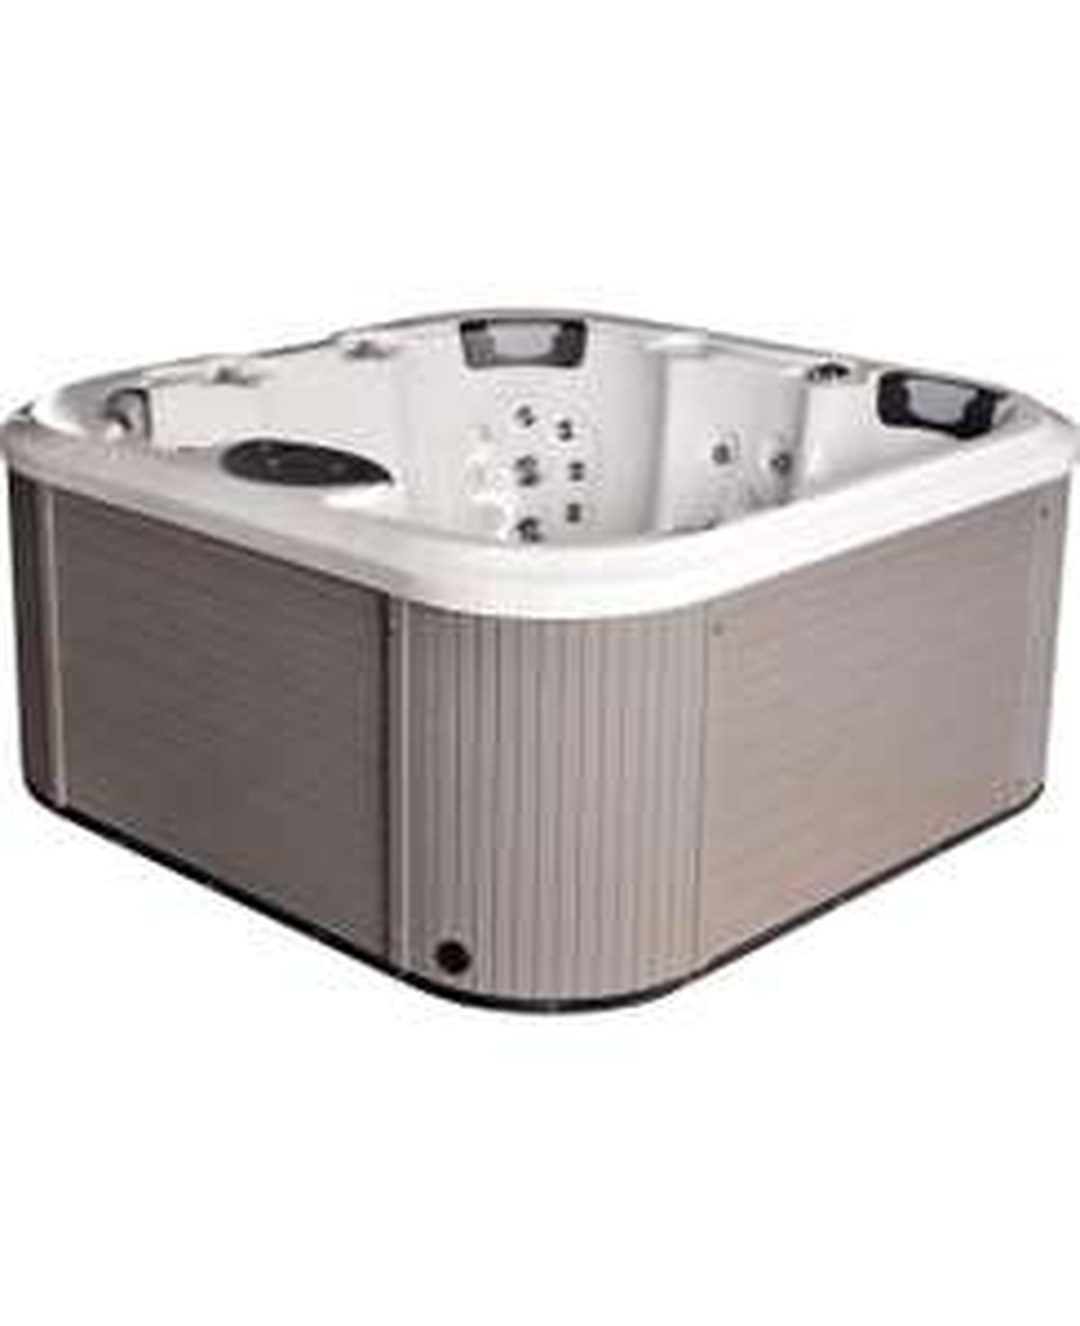 Whirlpool Ec1500 Florenz inkl. Uv Desinfektion